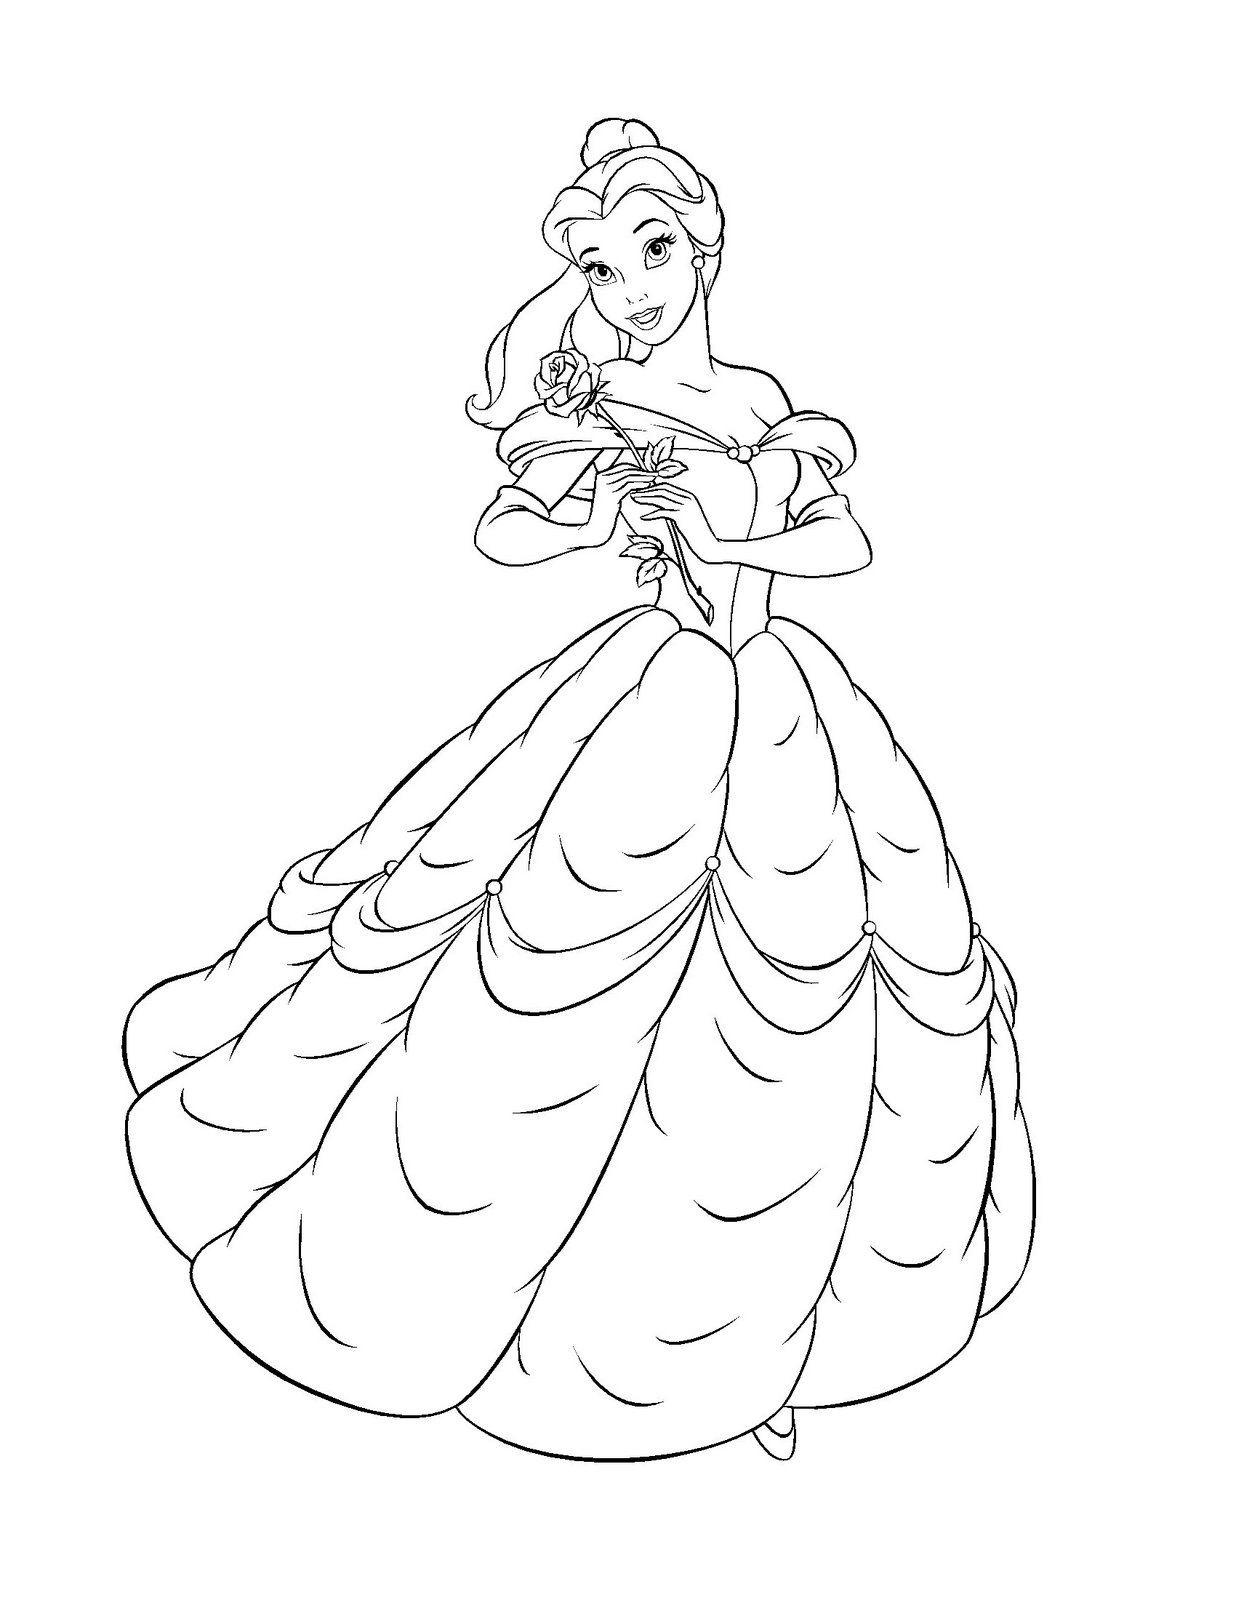 Belle Coloring Belle Coloring Belle Coloring Book Belle Coloring Pages Belle Col Belle Coloring Pages Disney Princess Coloring Pages Disney Princess Colors